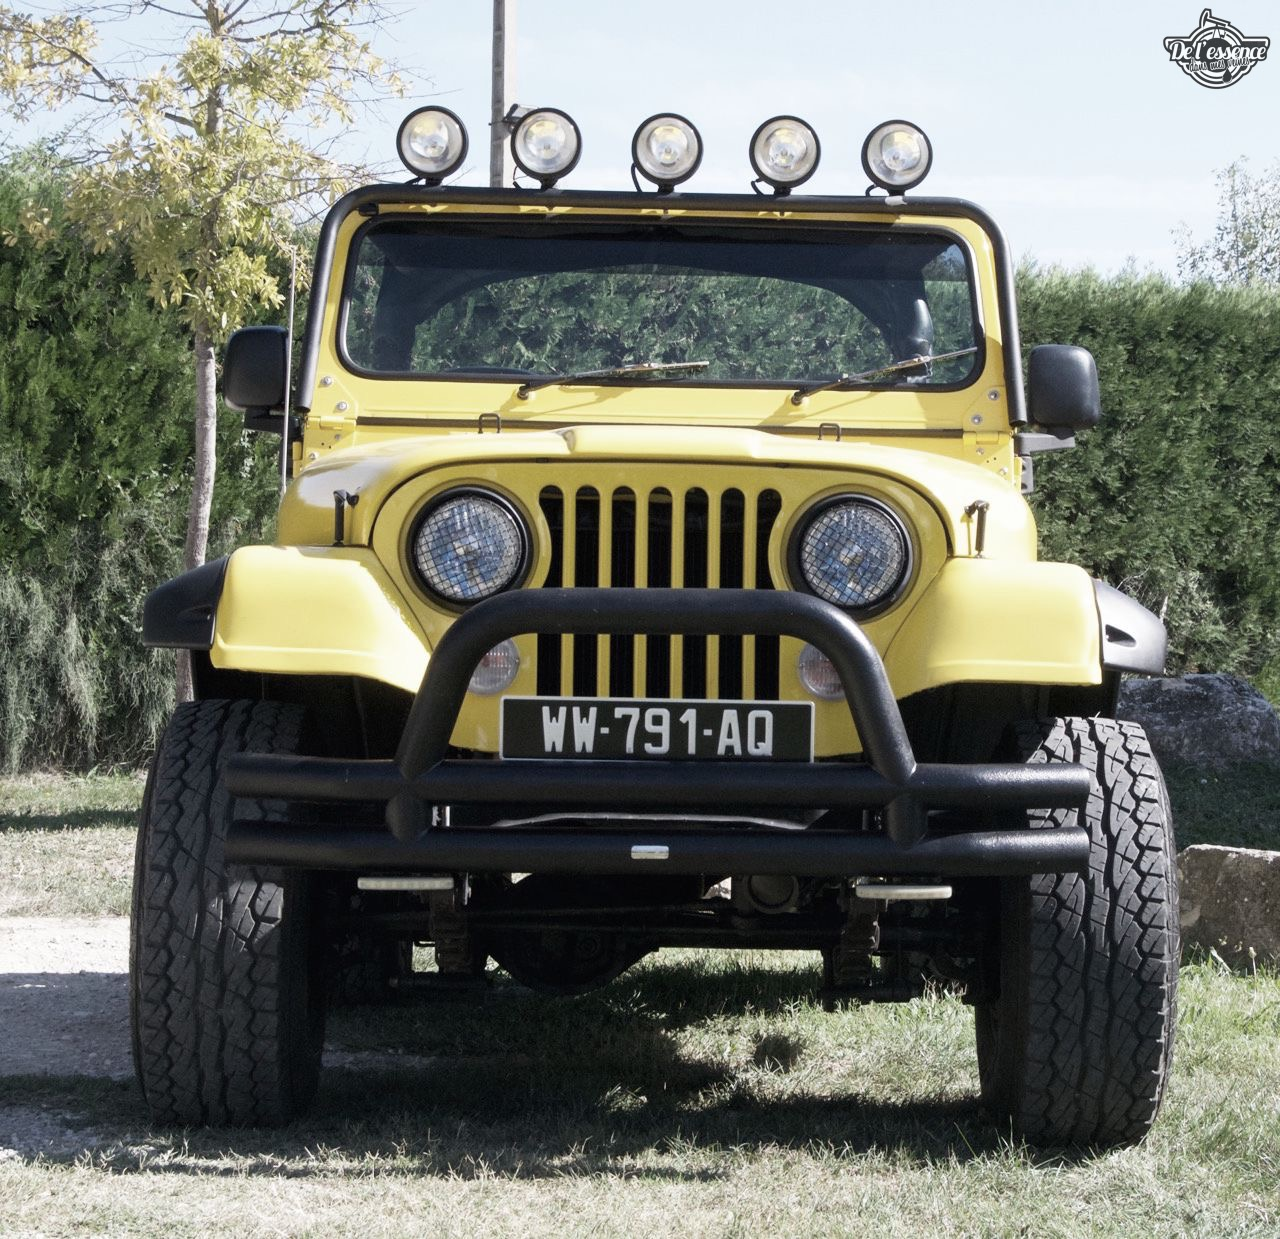 '82 Jeep CJ-7 Laredo - Quand tu te fais chier sur la route... 54